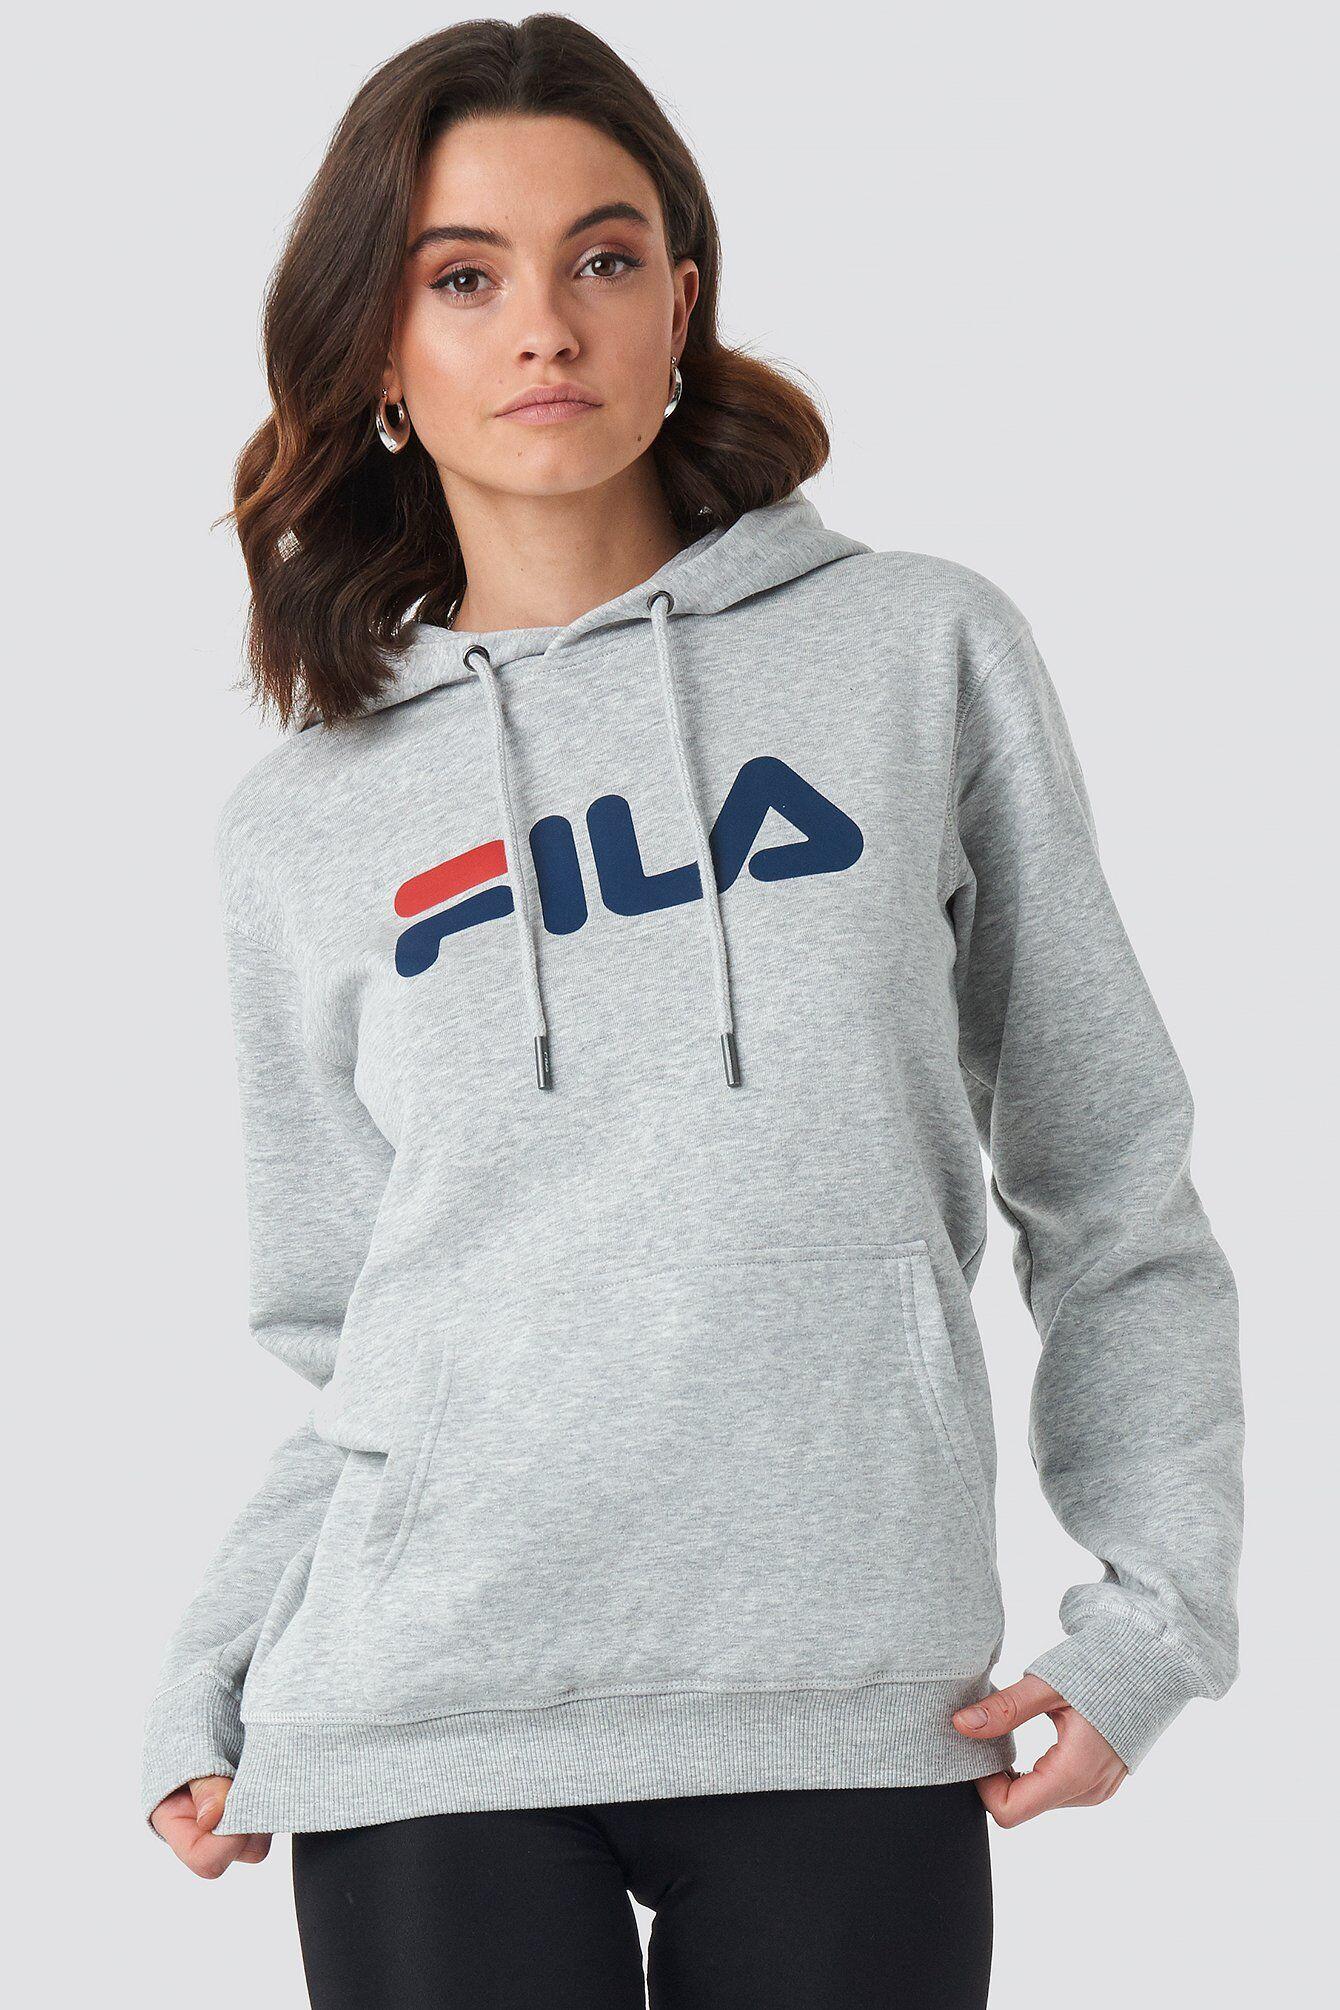 FILA Classic Pure Hoody Kangaroo - Grey  - Size: Small